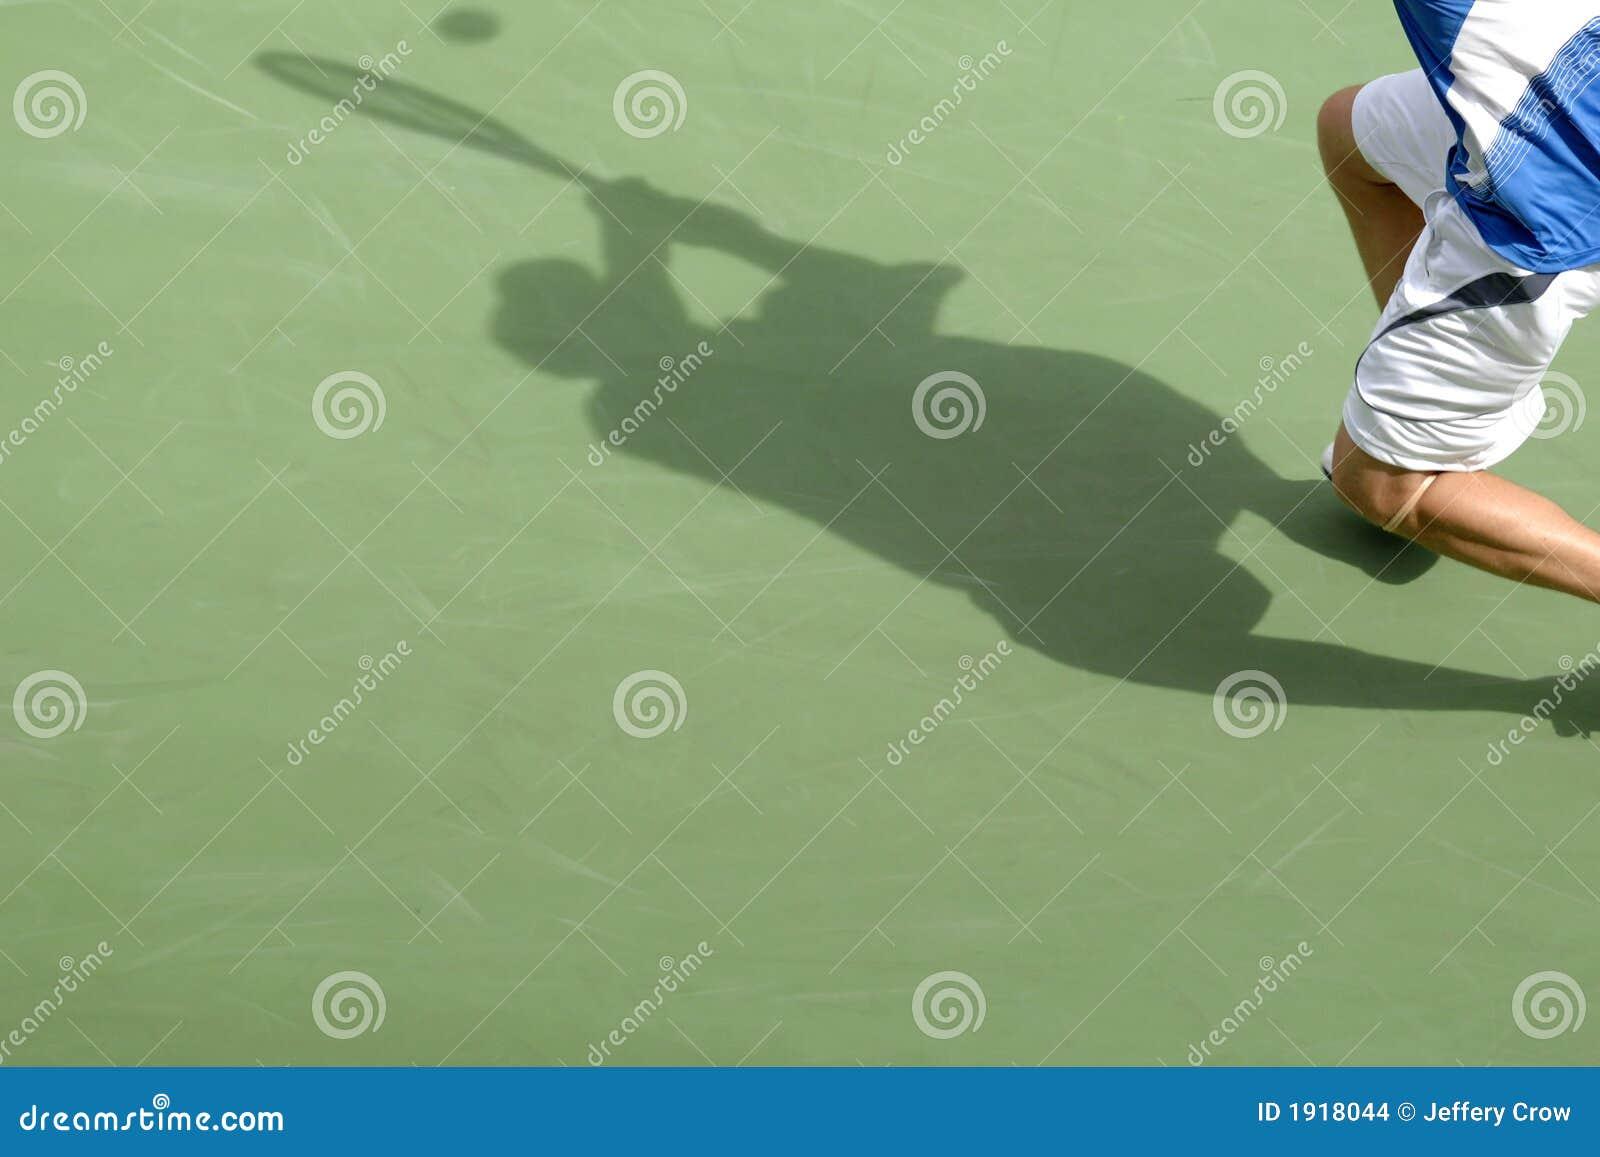 Tennis shadow 01